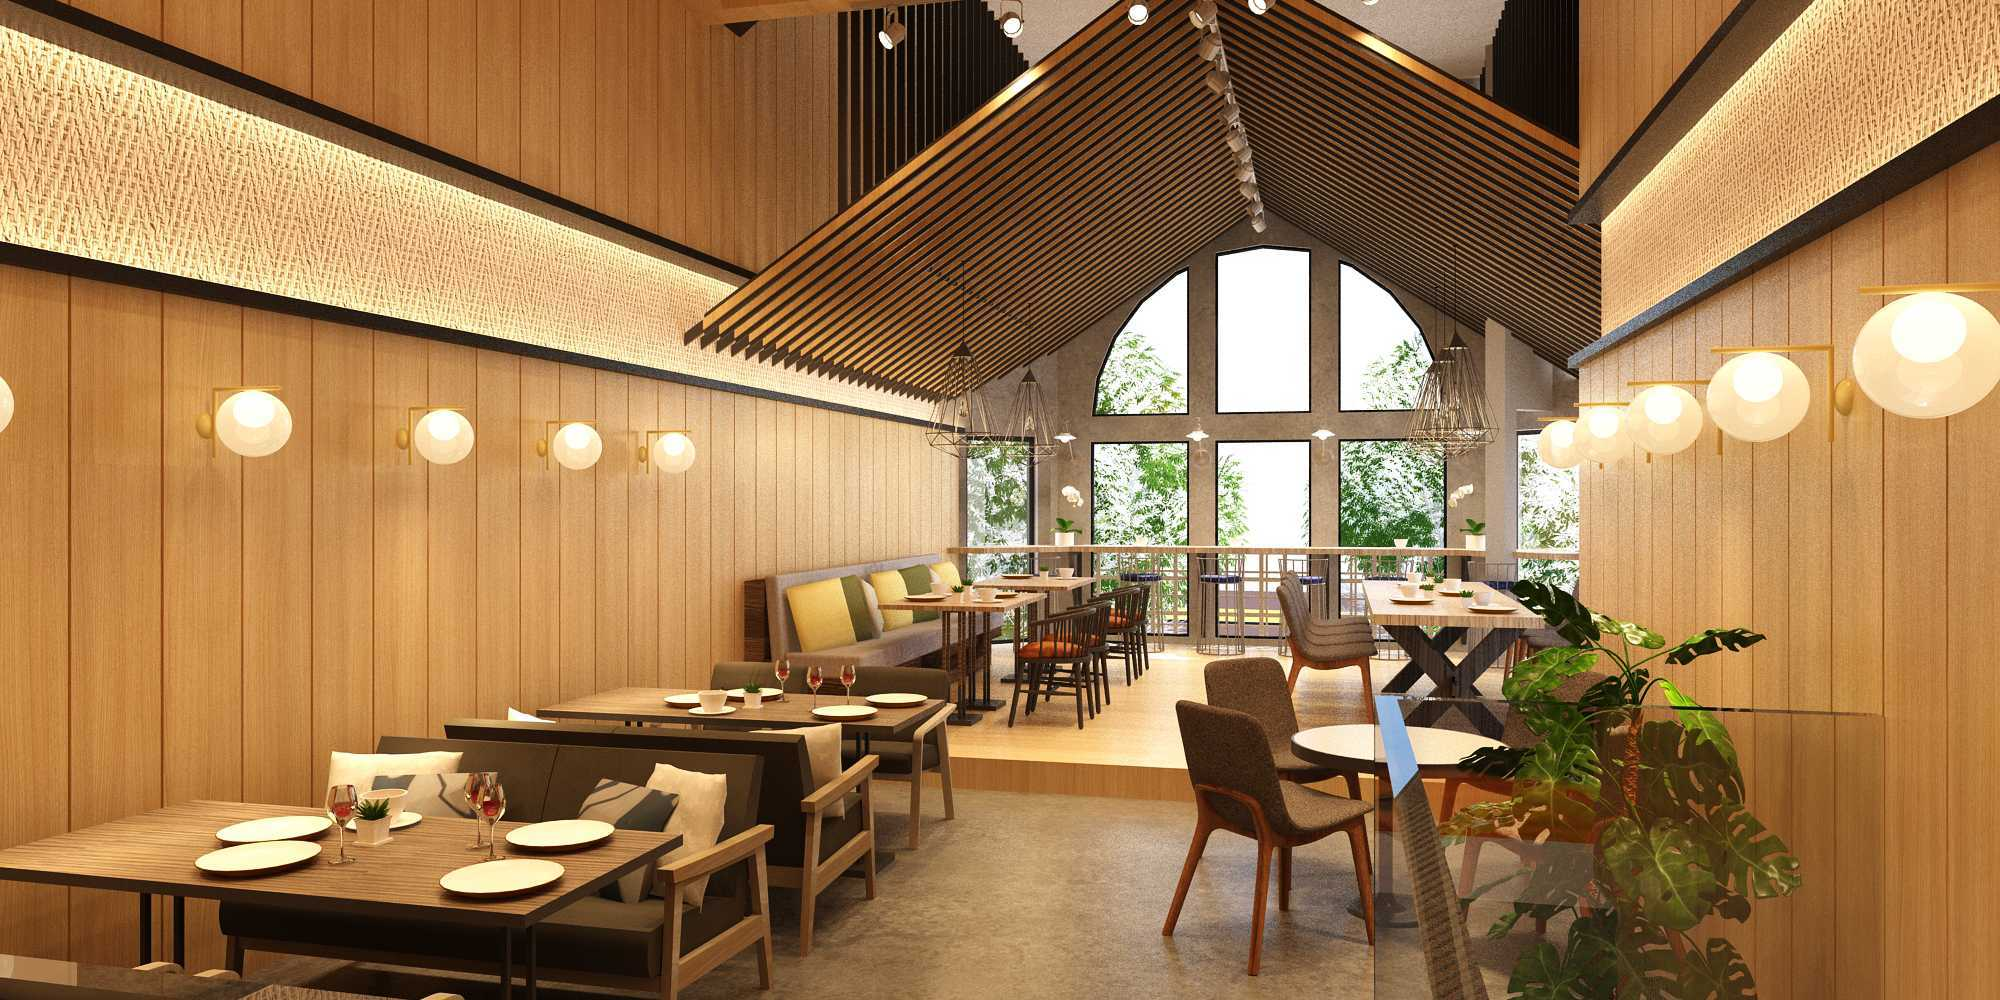 Jasa Interior Desainer Design N Aesthetics studio di Tangerang